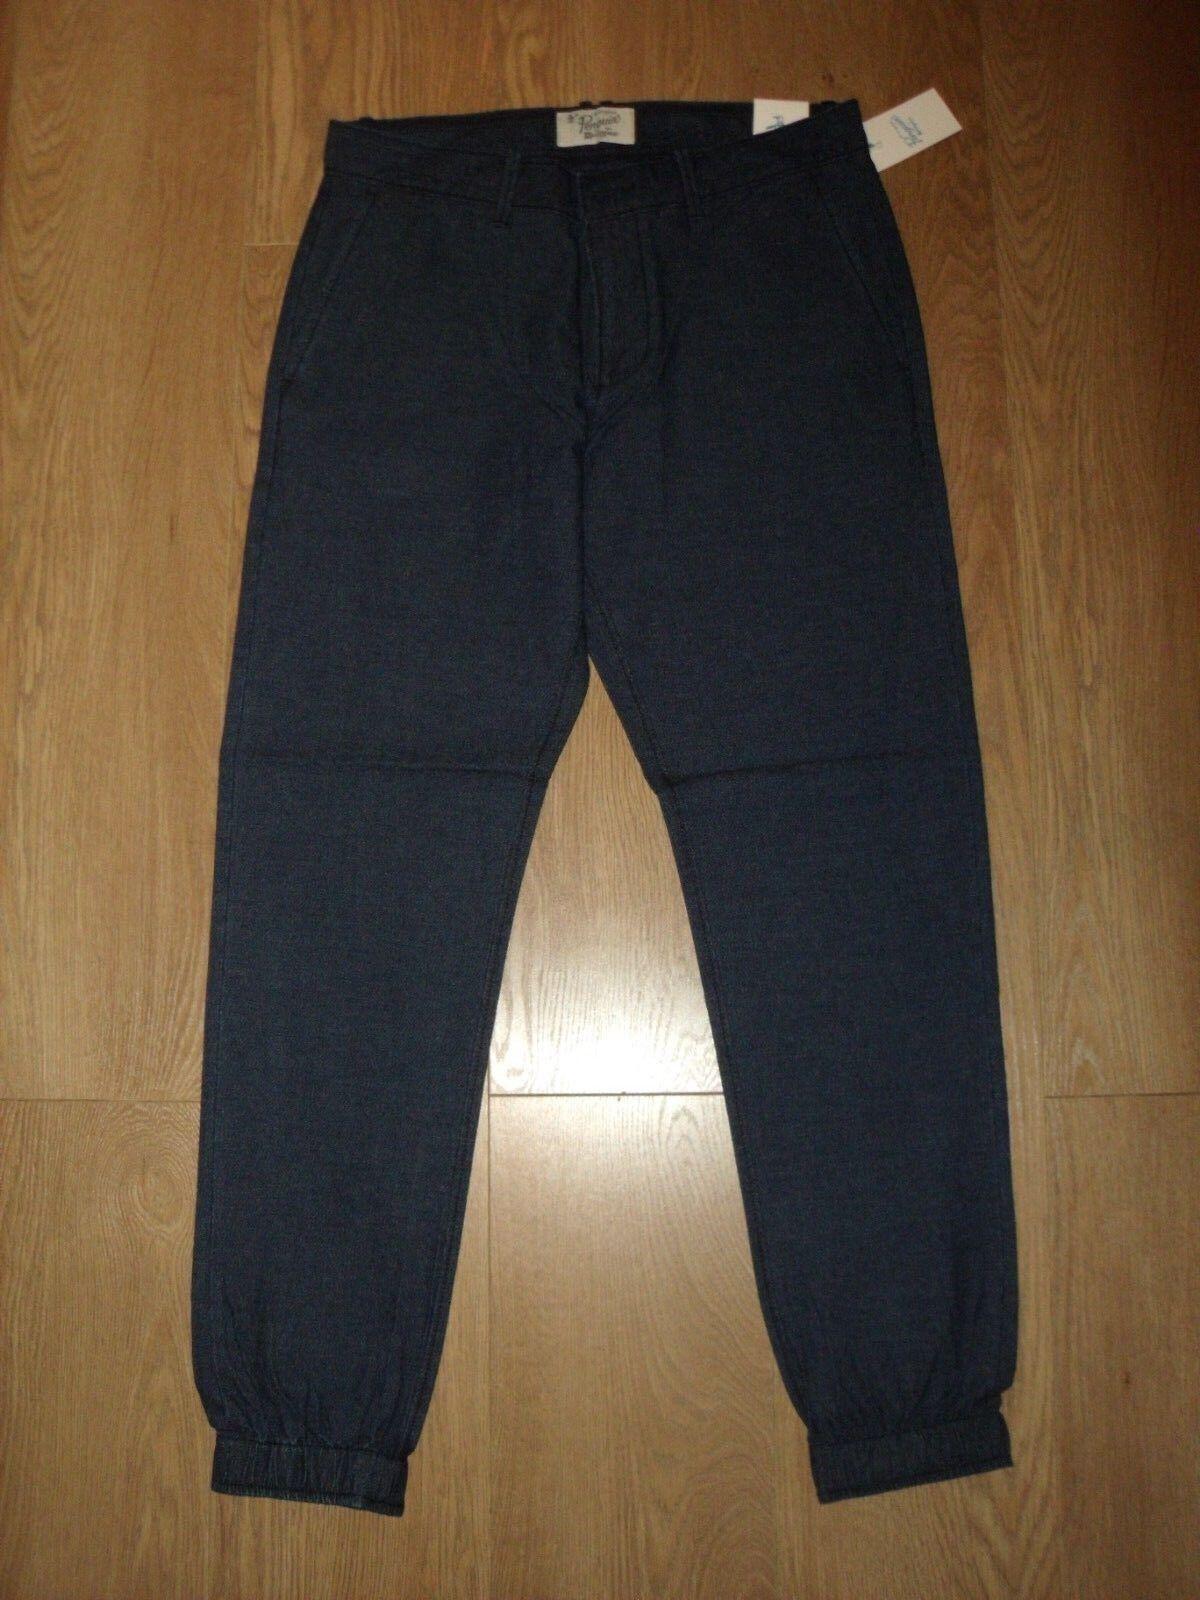 Original Penguin Enge Passform Cargo Hose Leichte Baumwolle Dunkel Jeans W32 R